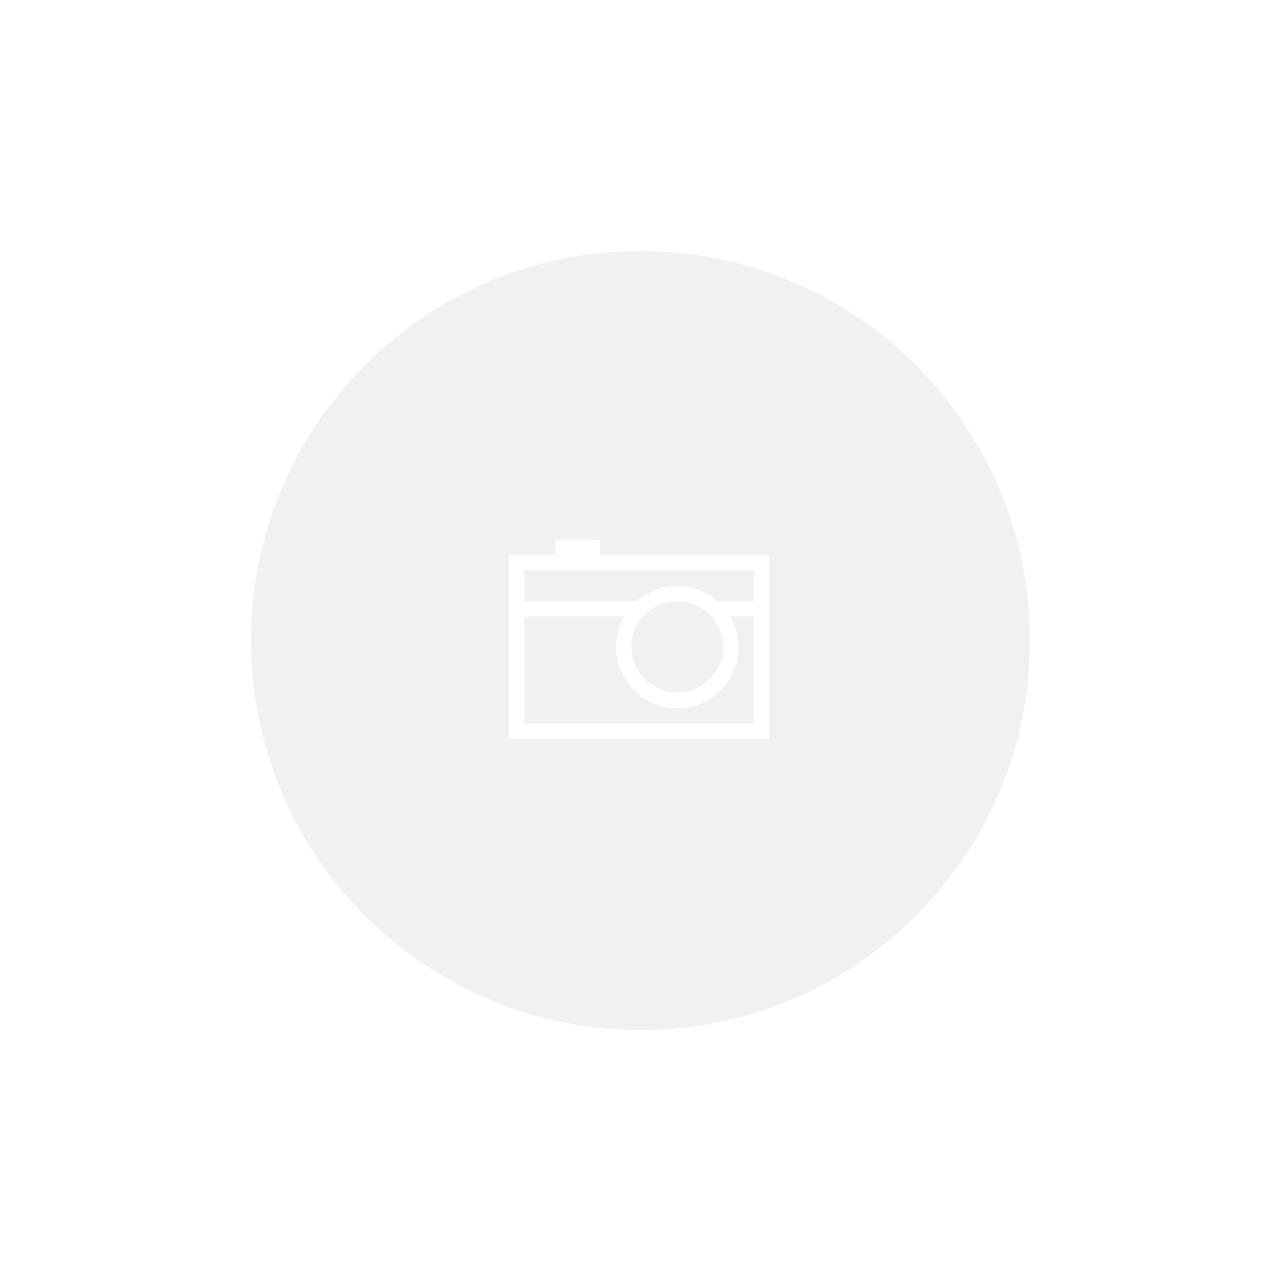 VISTA LIGHT TRIANGULAR RECARREGÁVEL USB